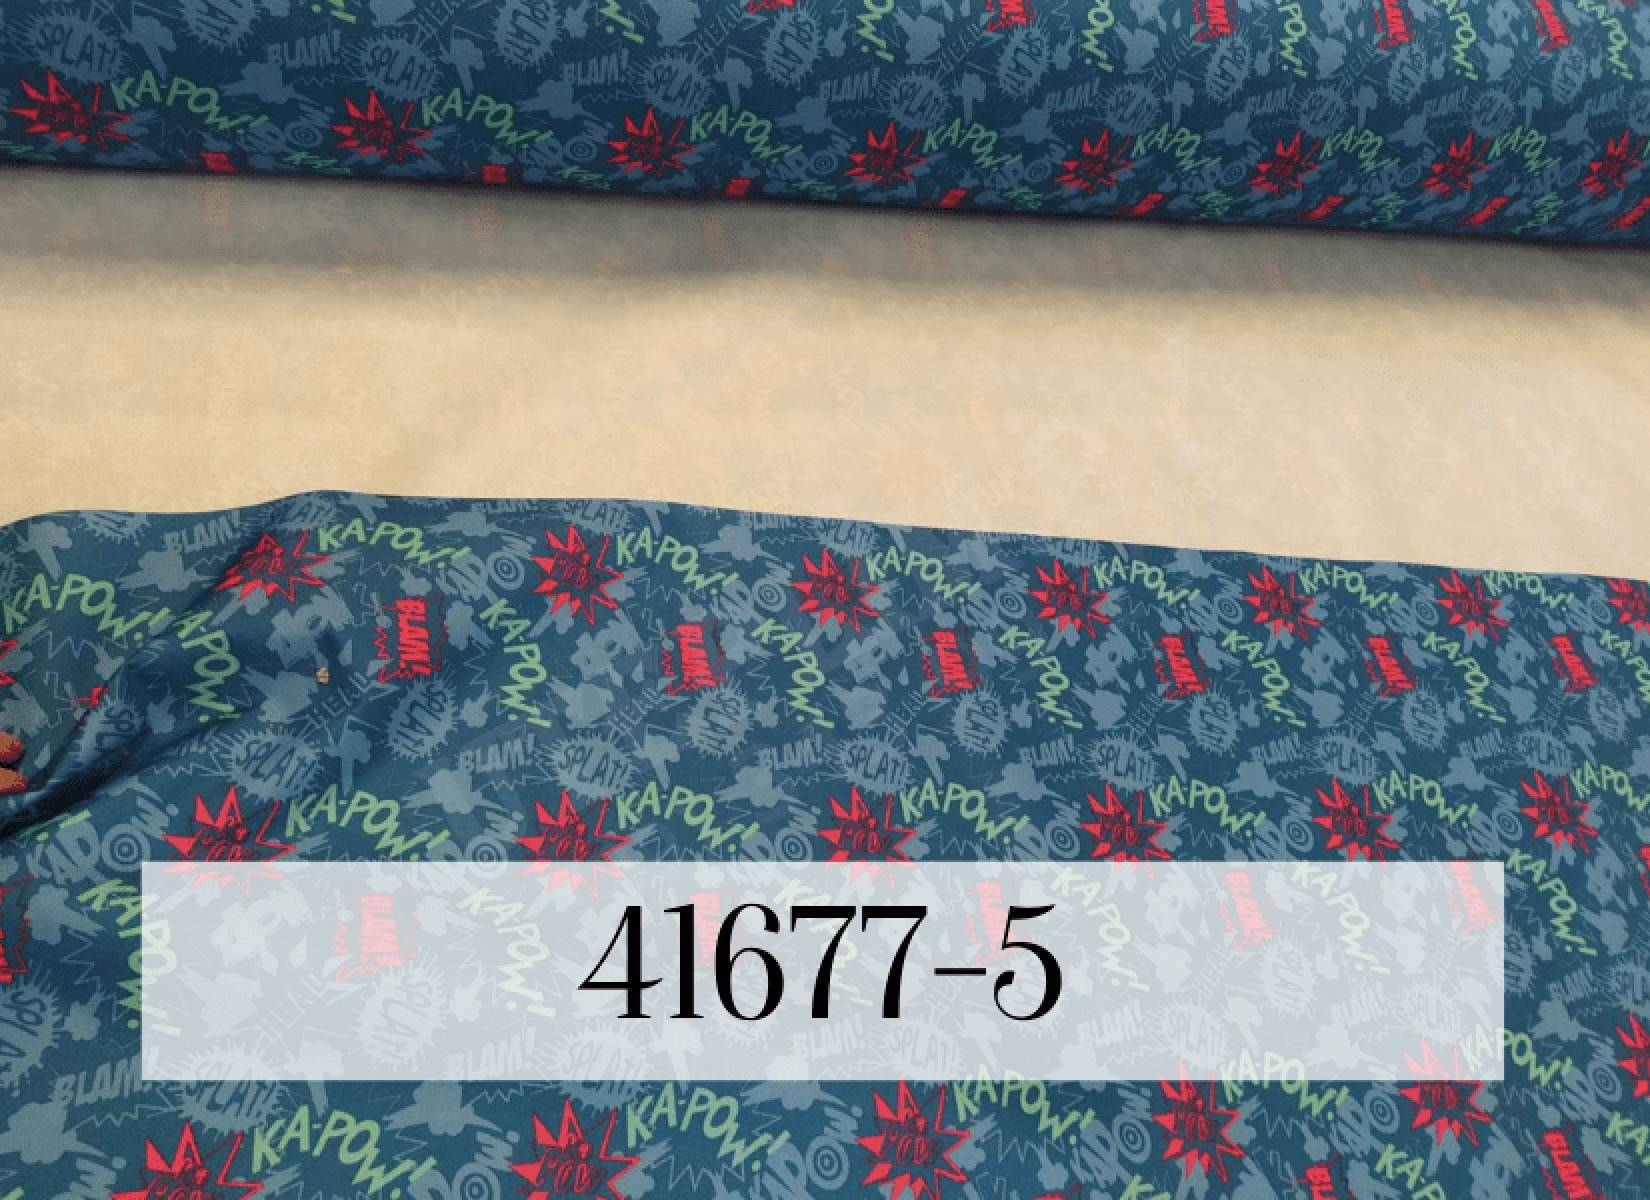 600д - буквы 41677-5